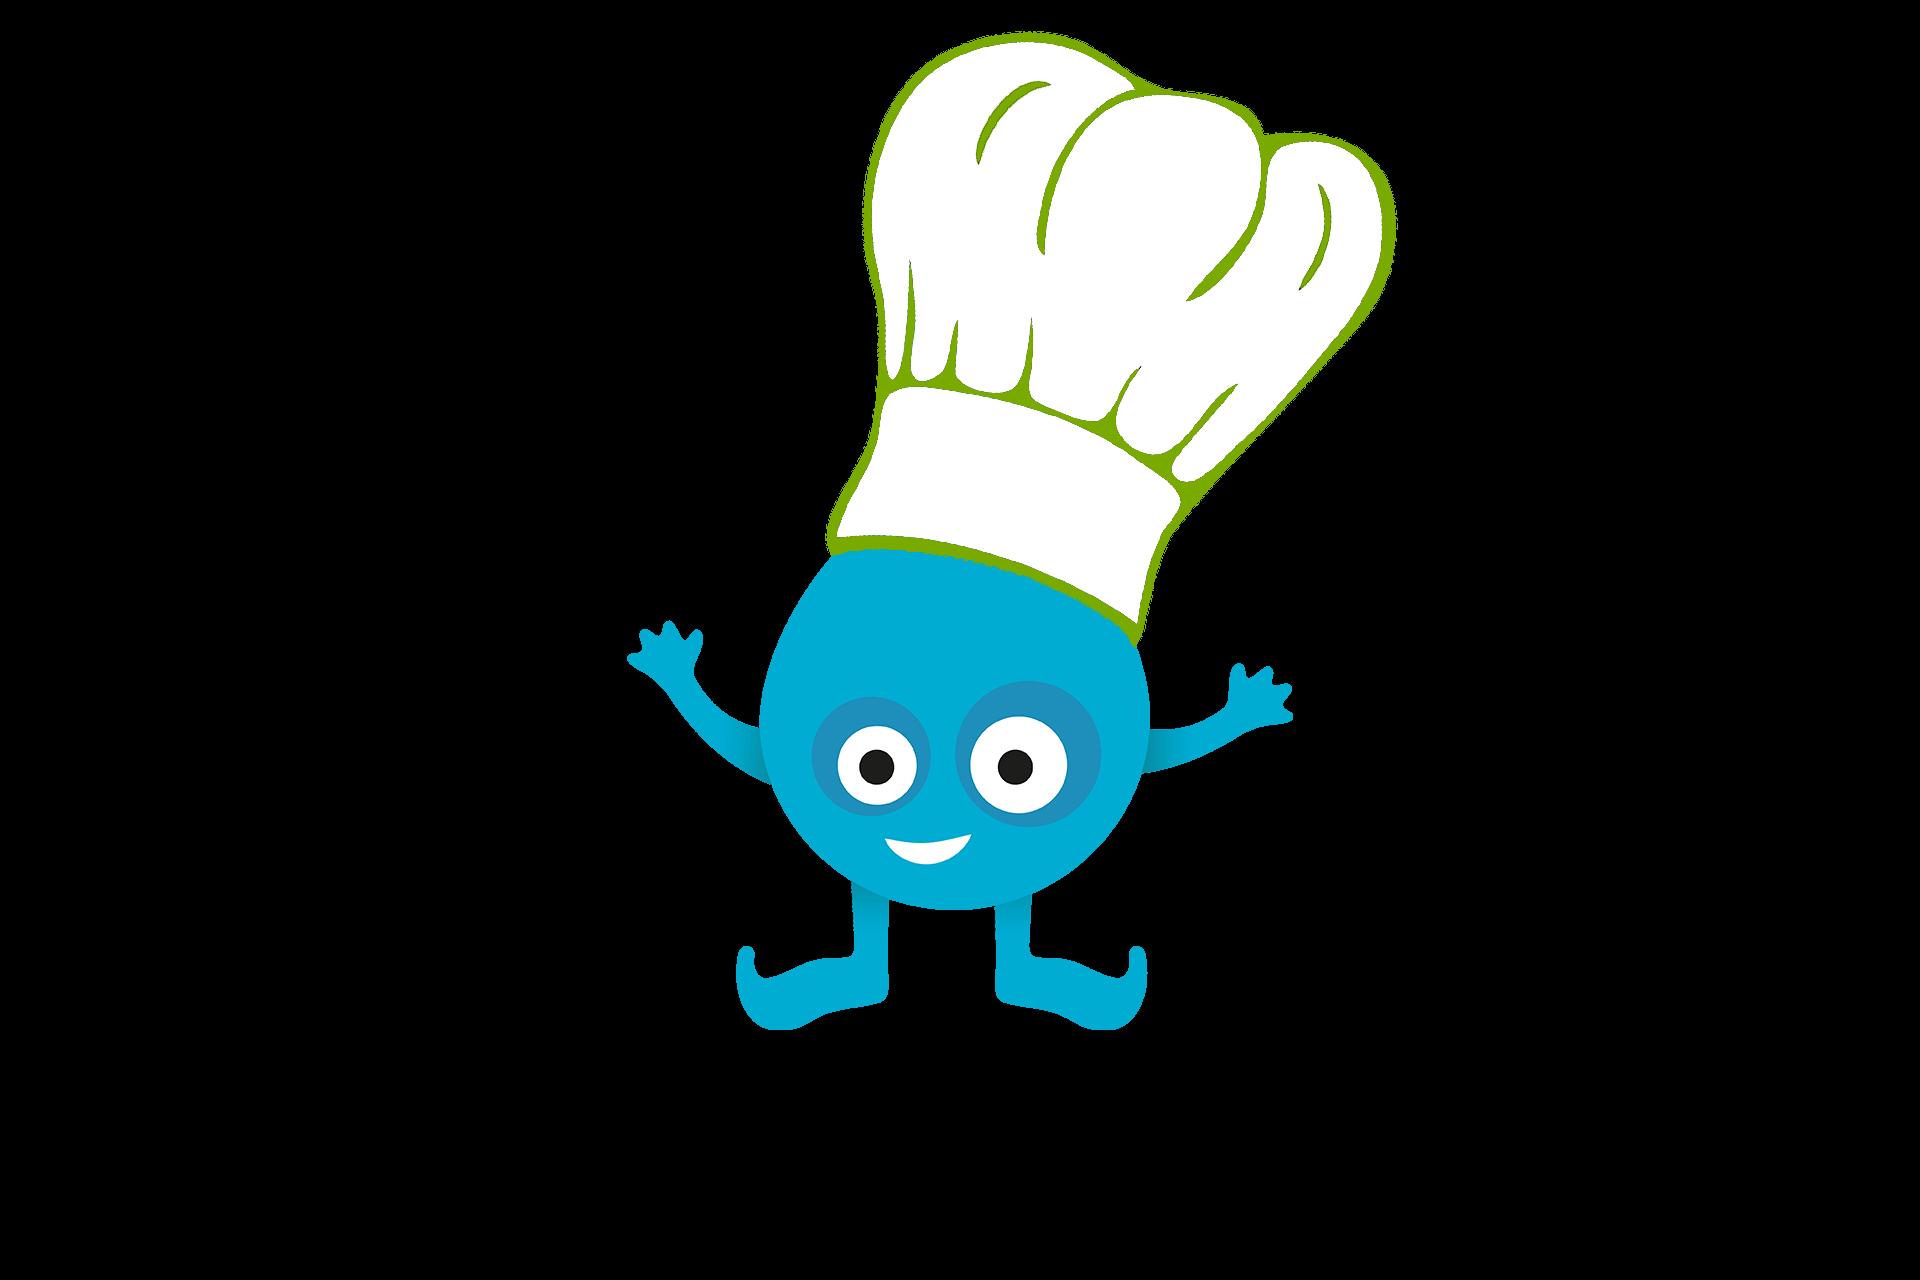 rör-else som kock-else